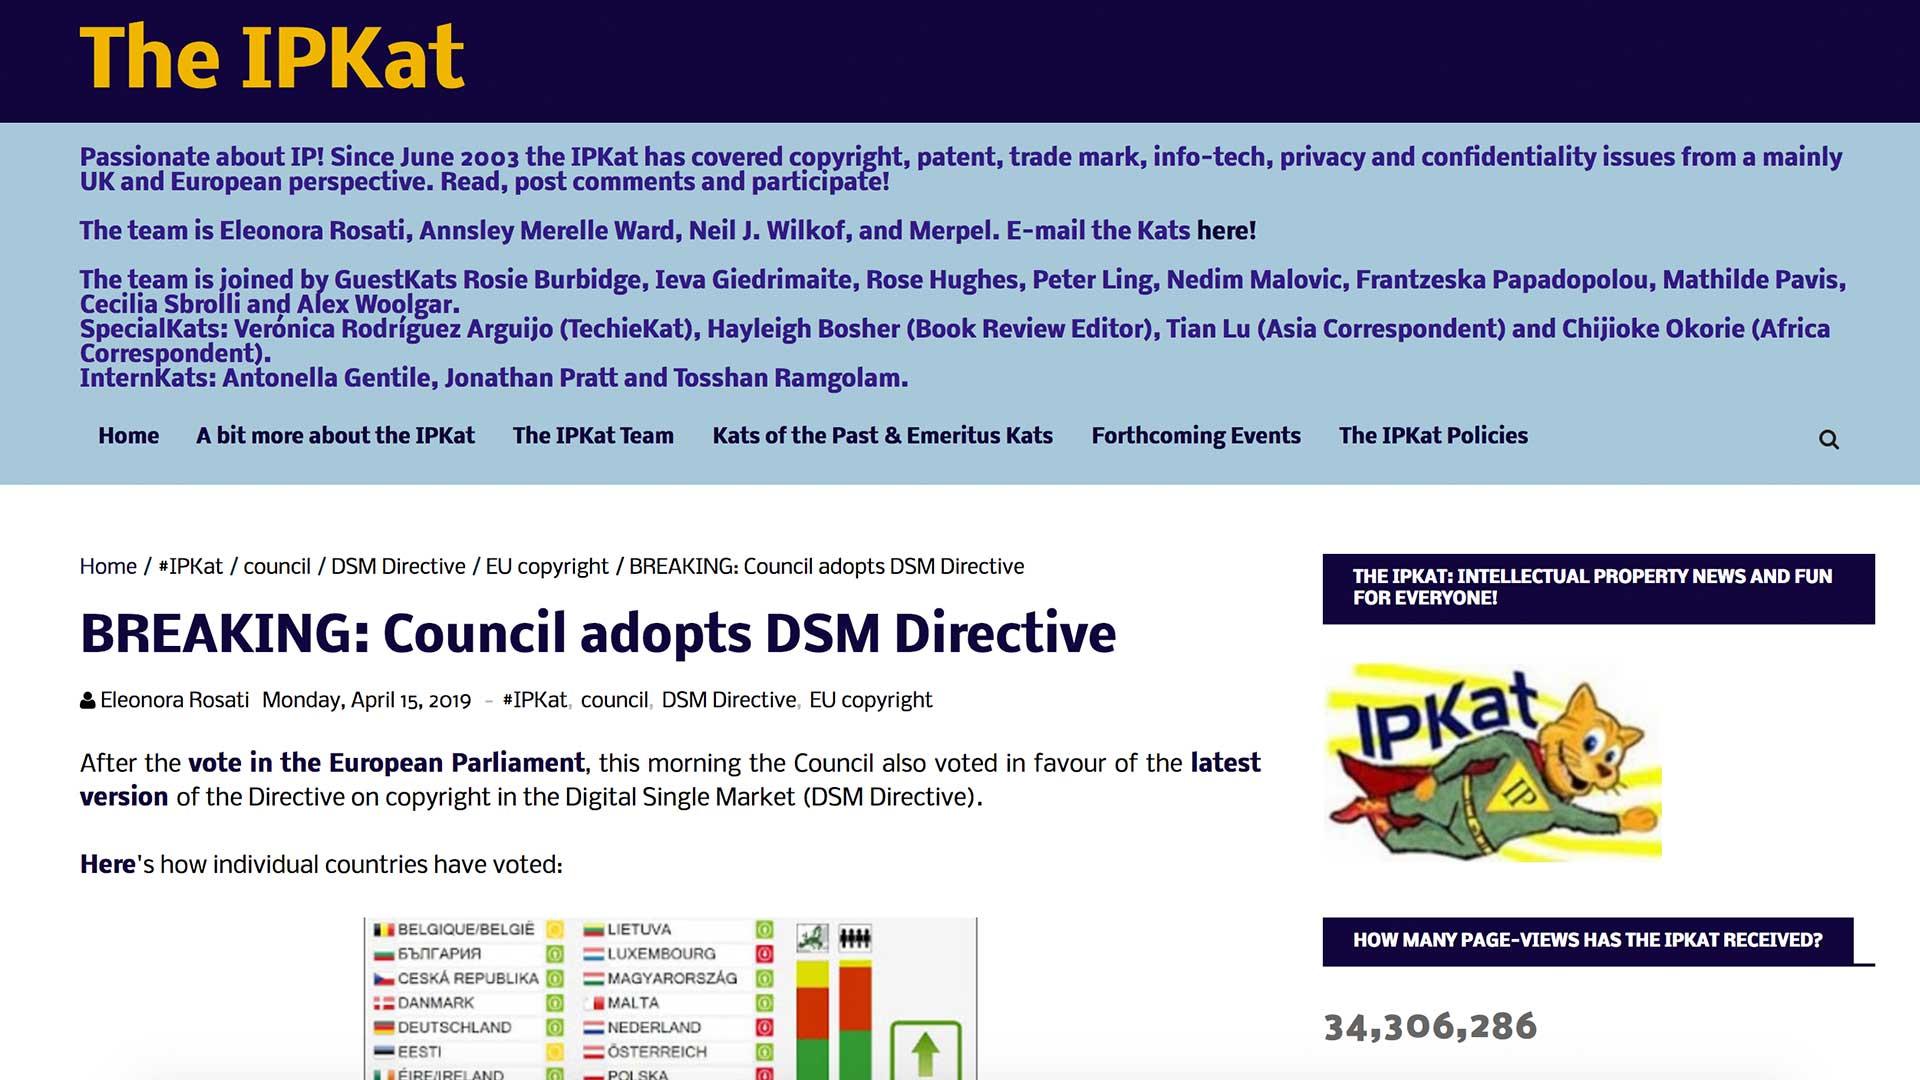 Fairness Rocks News BREAKING: Council adopts DSM Directive